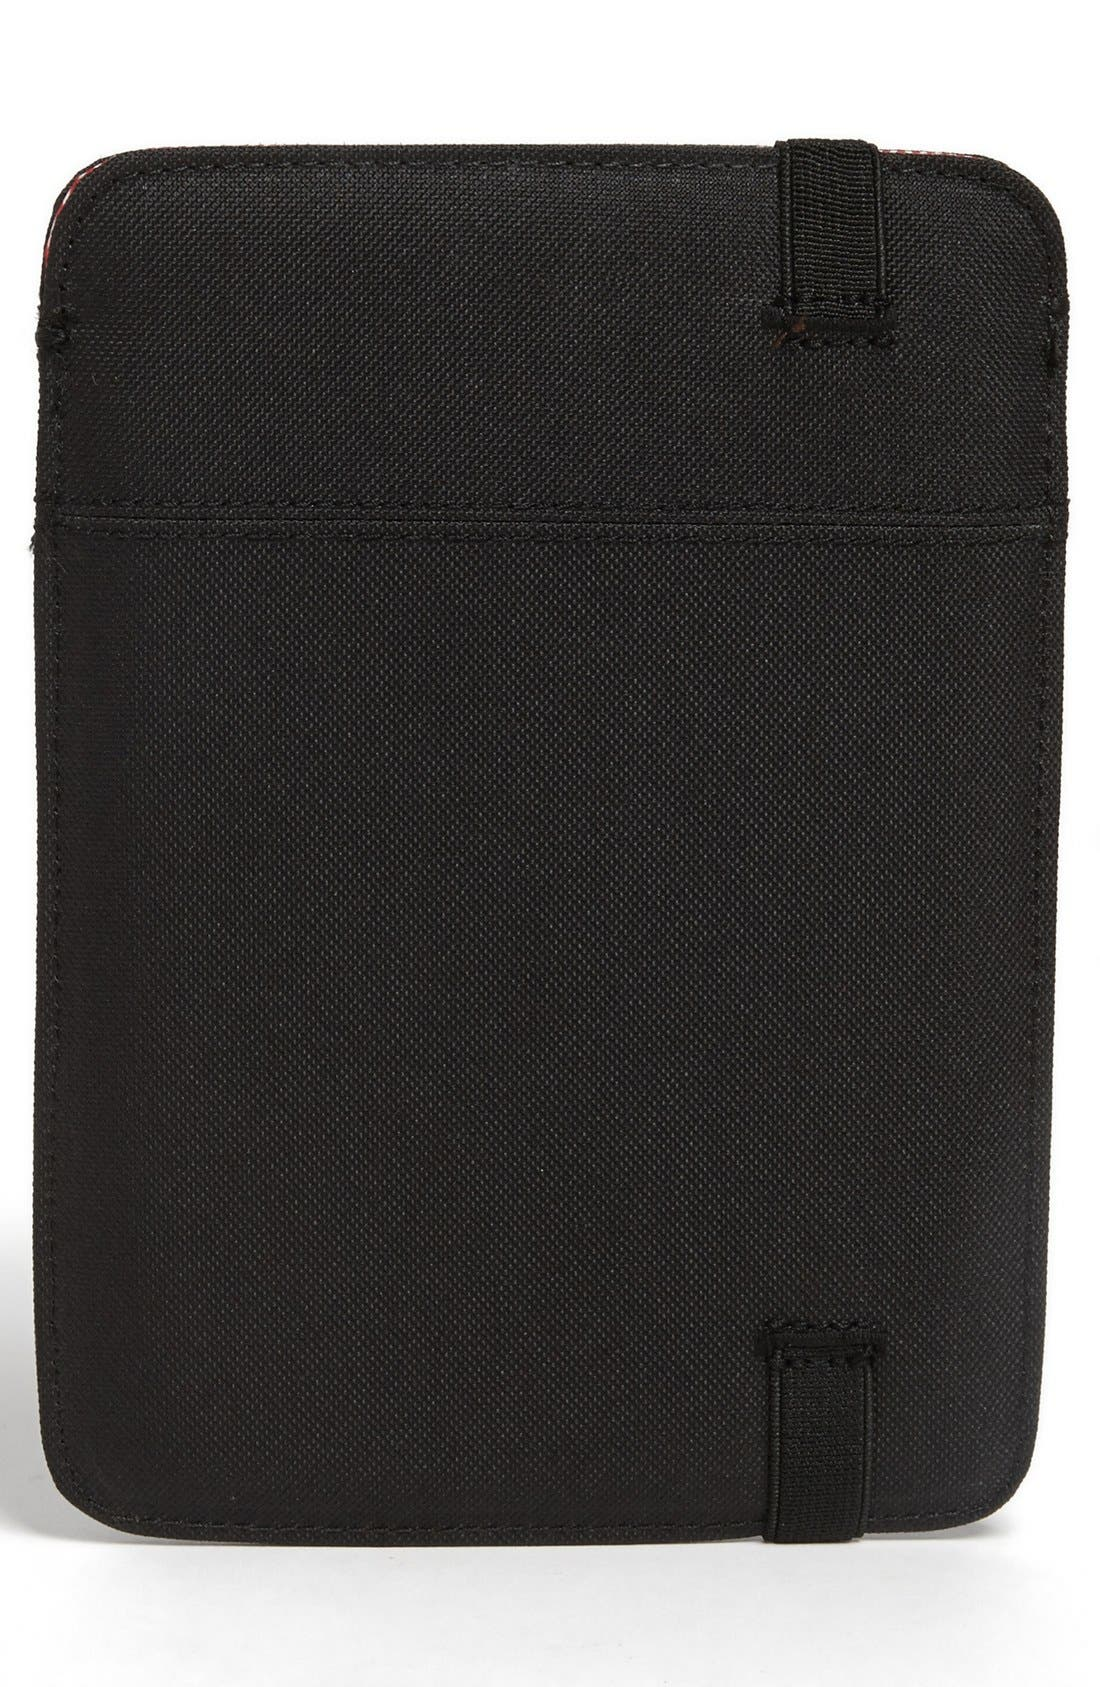 Alternate Image 4  - Herschel Supply Co. 'Cypress' Mini iPad Sleeve